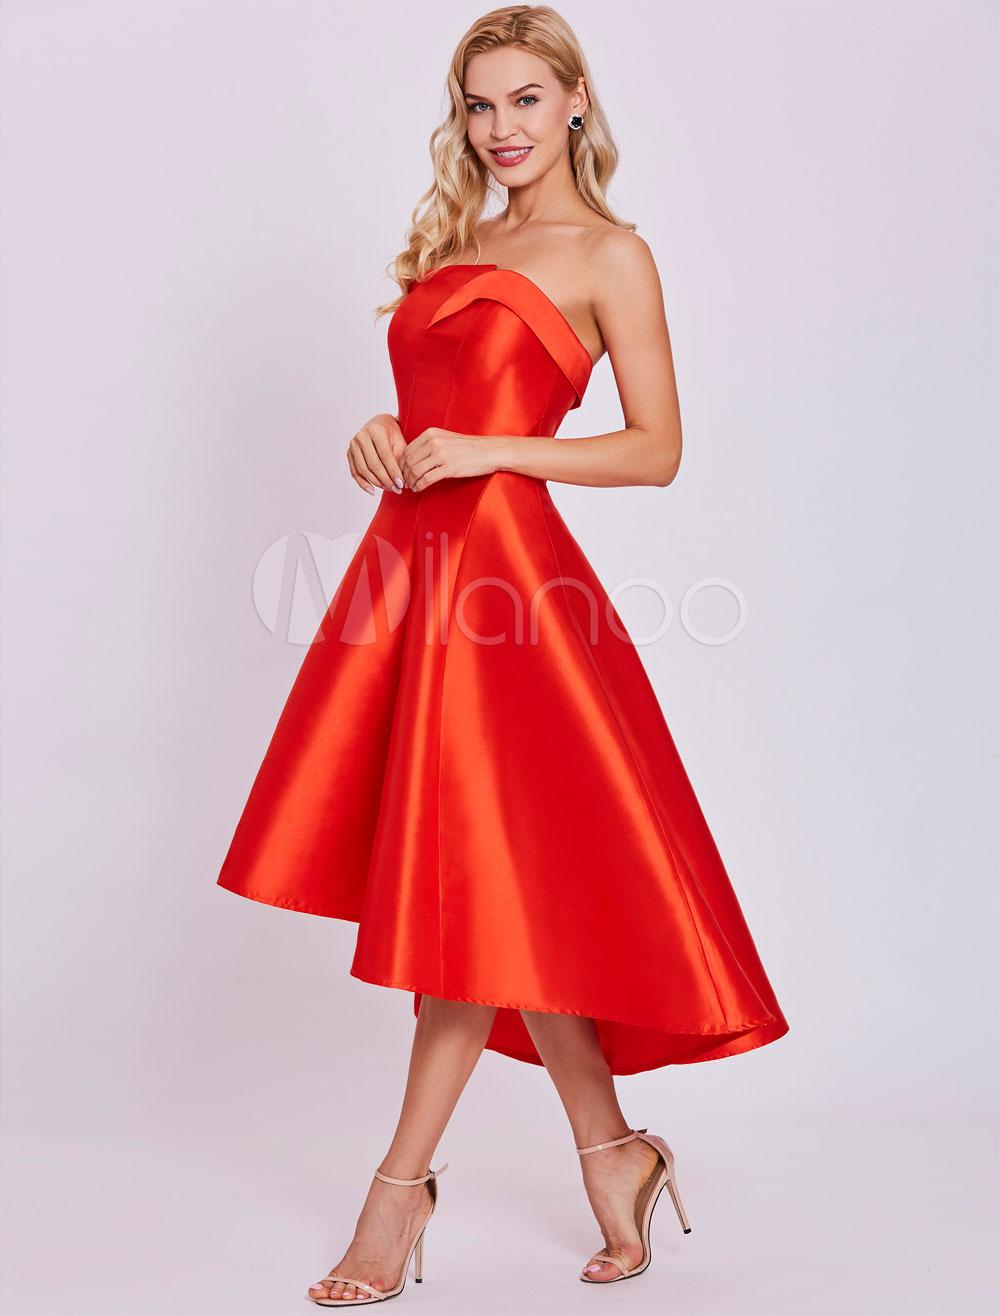 Red Cocktail Dresses Satin High Low Strapless Asymmetrical Short Graduation Dress